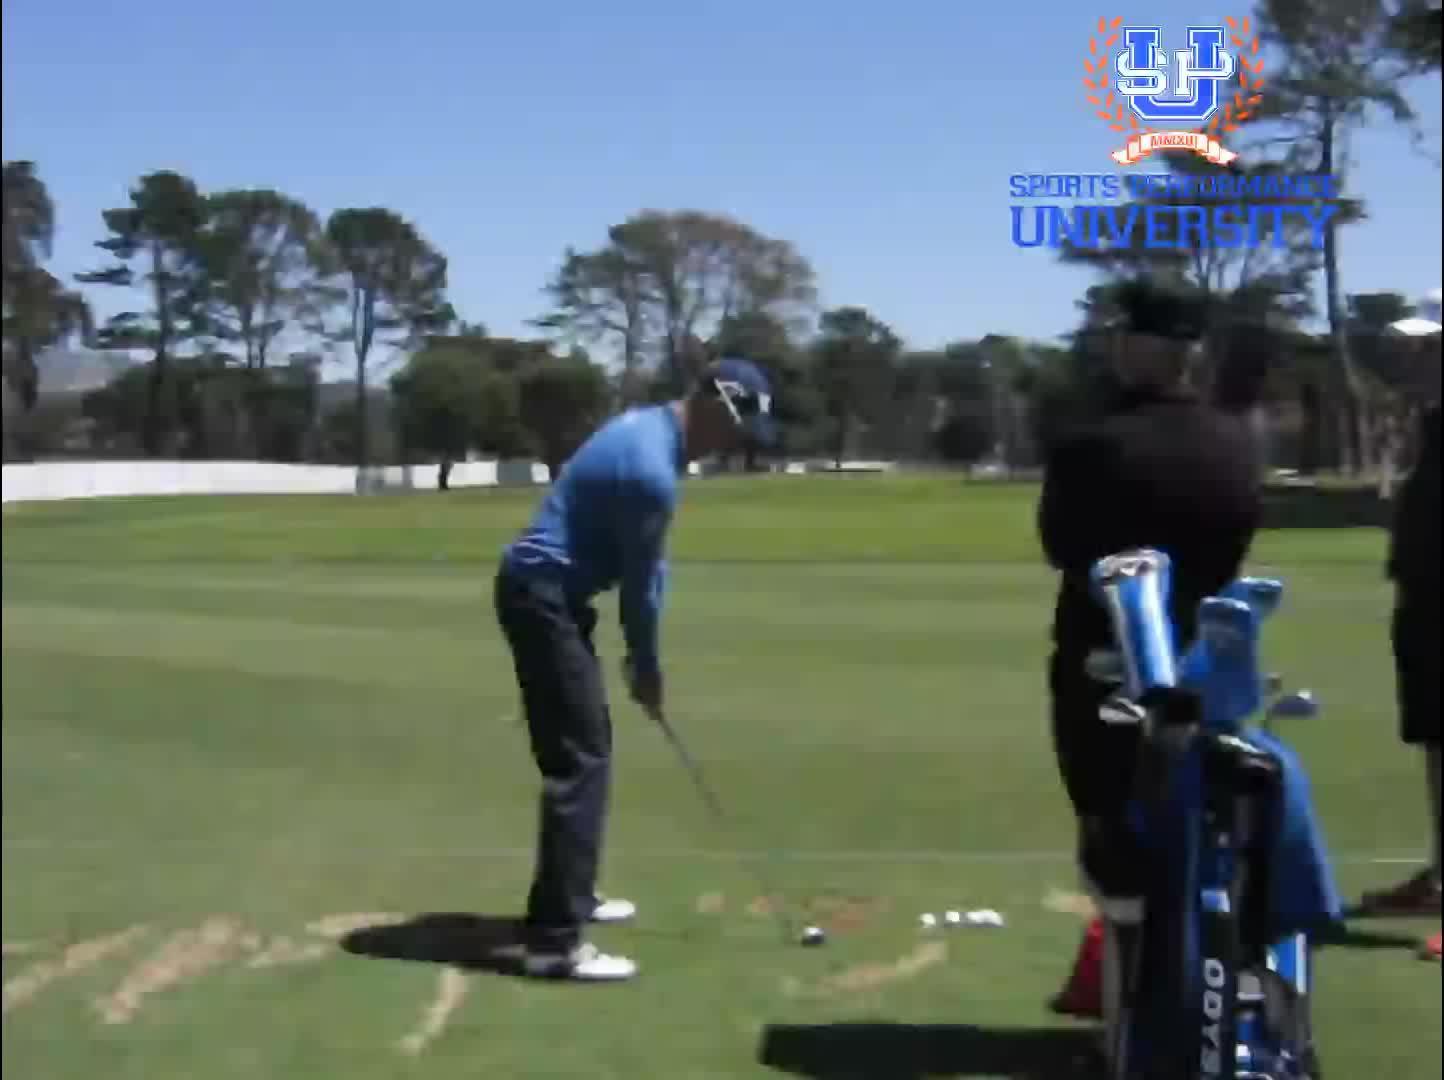 Henrik Stenson Golf Swing 2015 Iron Gif